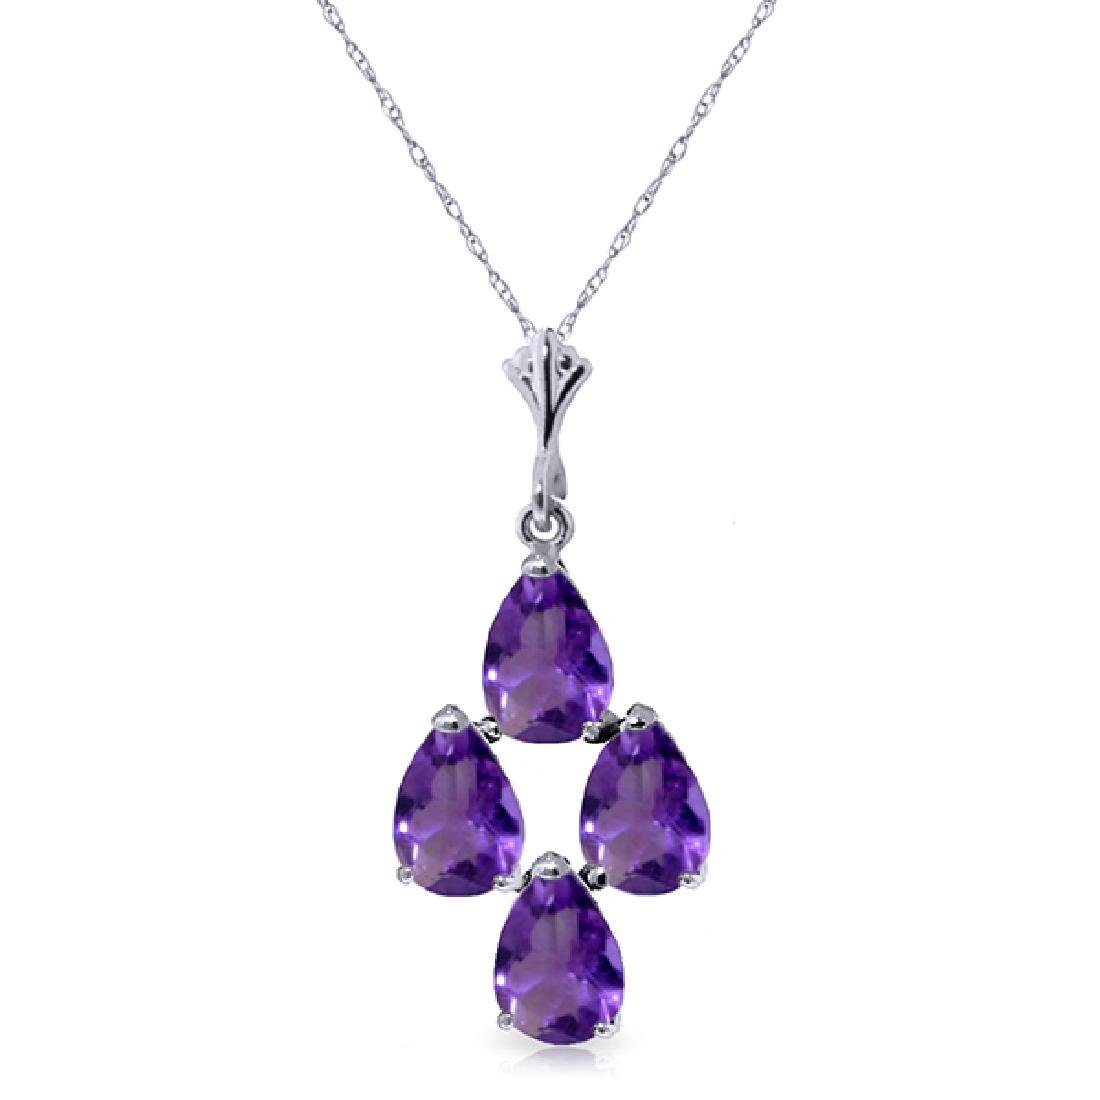 Genuine 1.50 ctw Amethyst Necklace Jewelry 14KT White